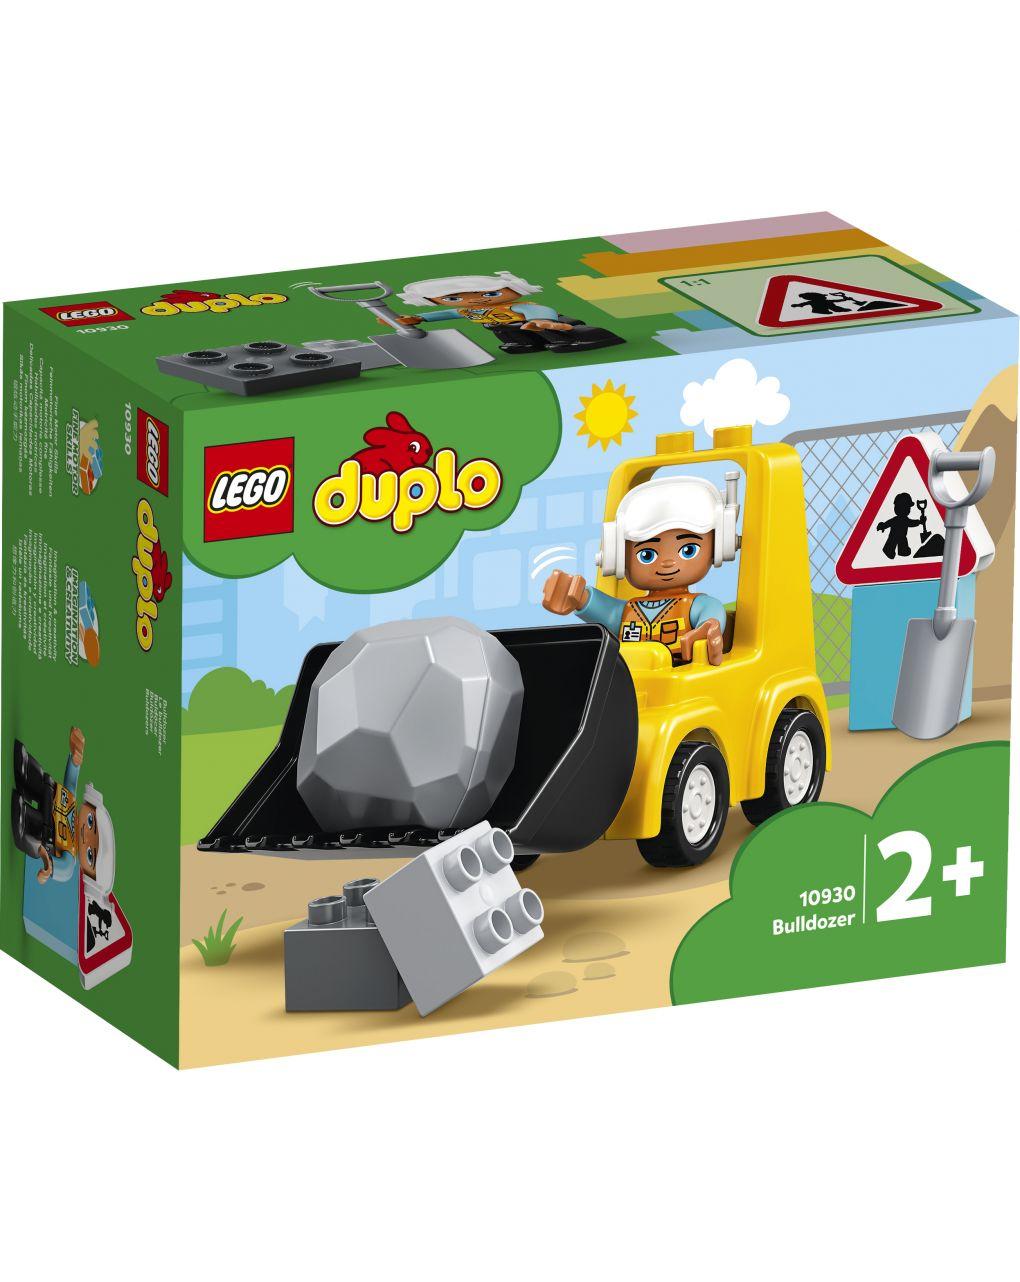 Duplo - bulldozer - 10930 - LEGO Duplo